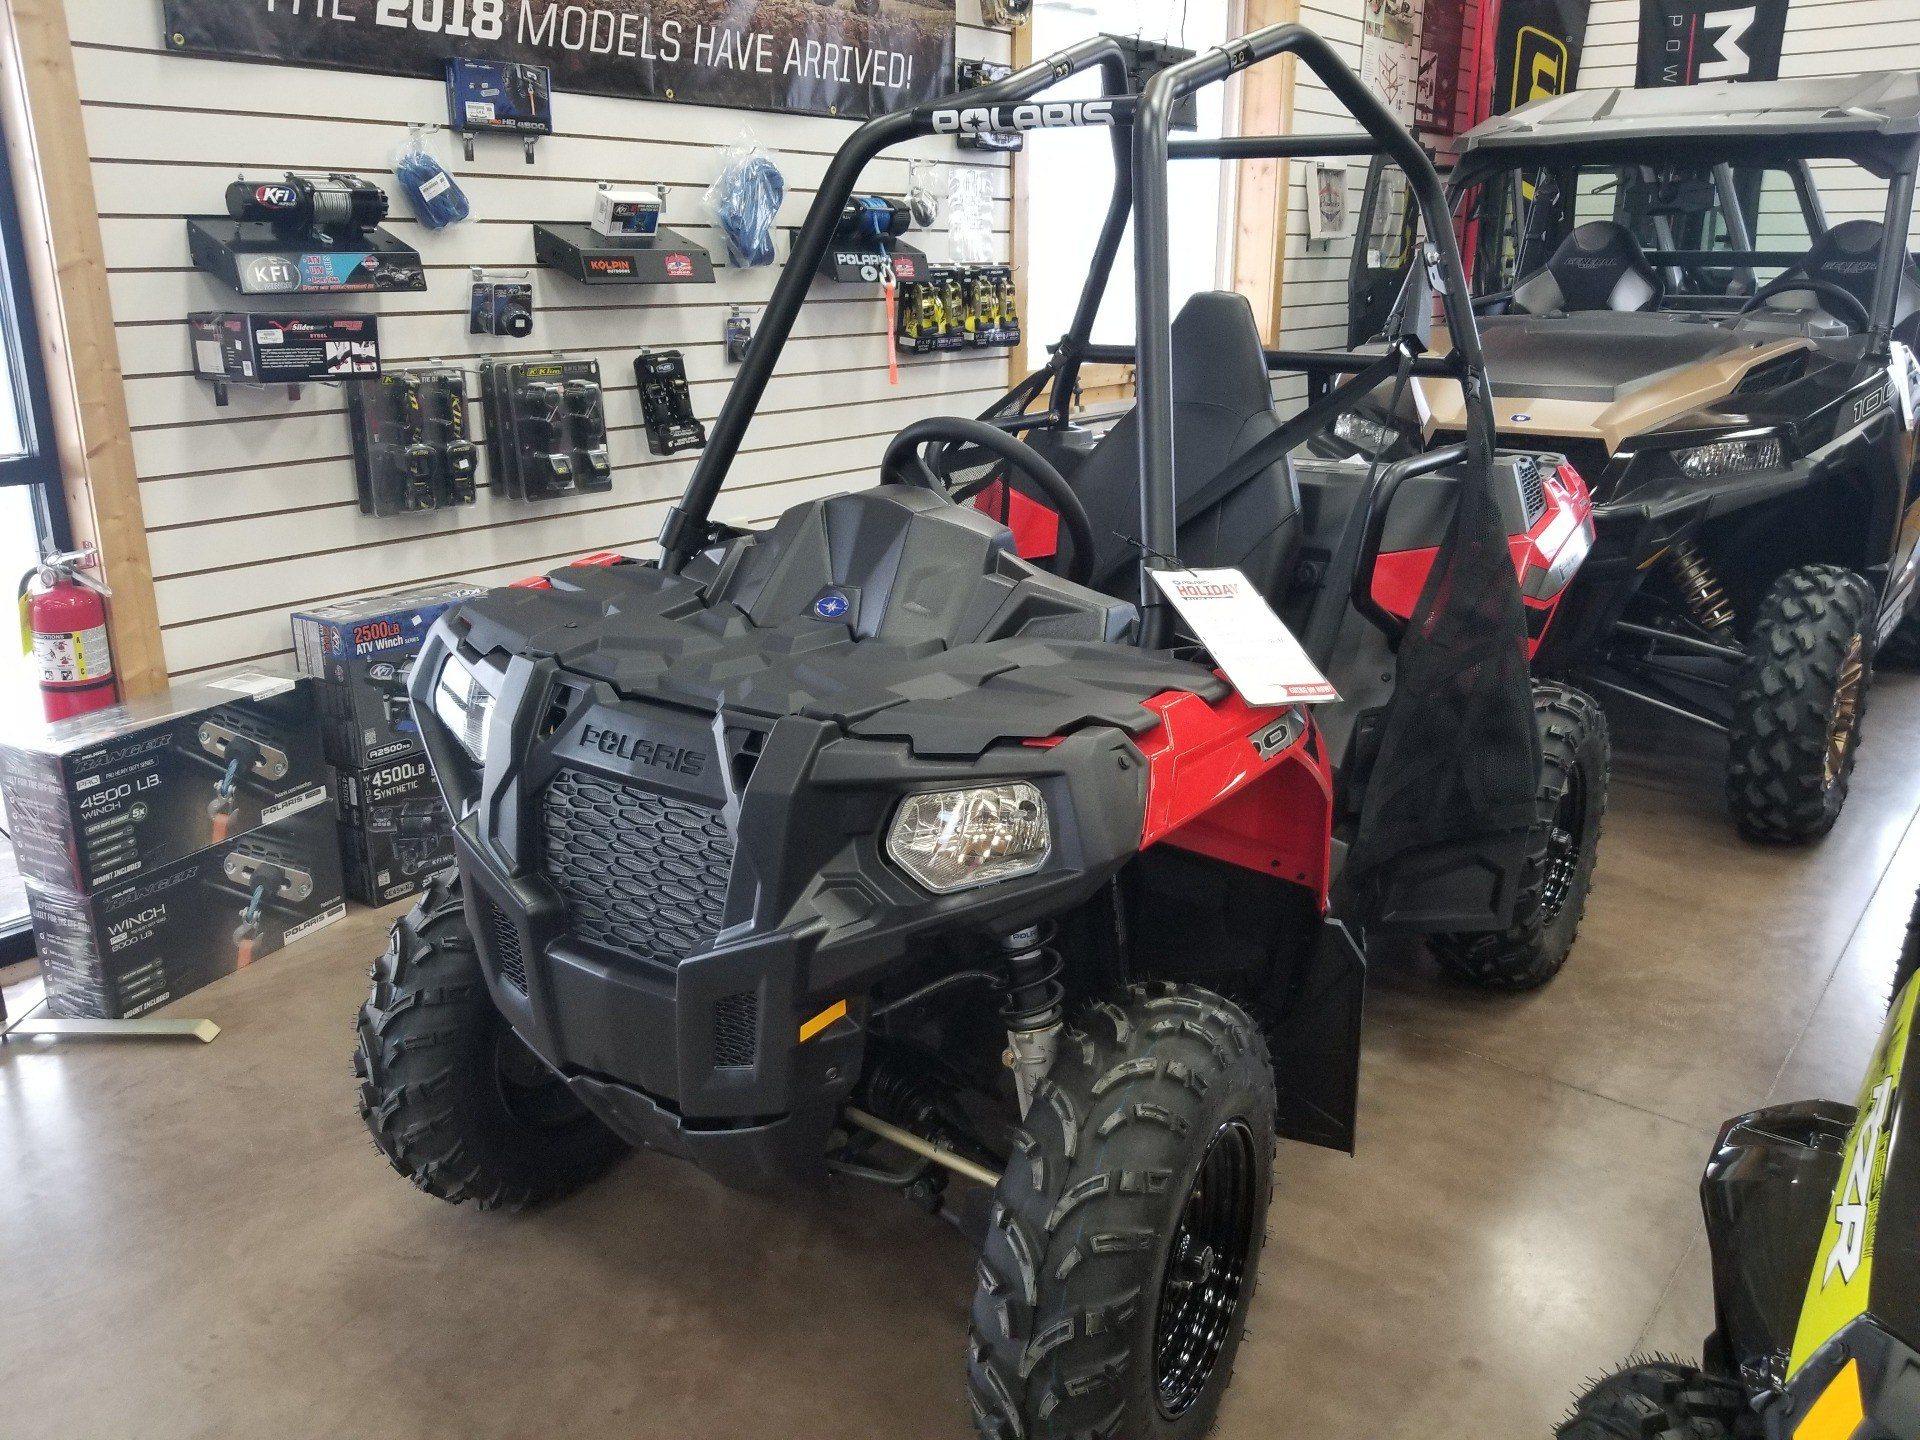 2018 Polaris Ace 500 for sale 16412